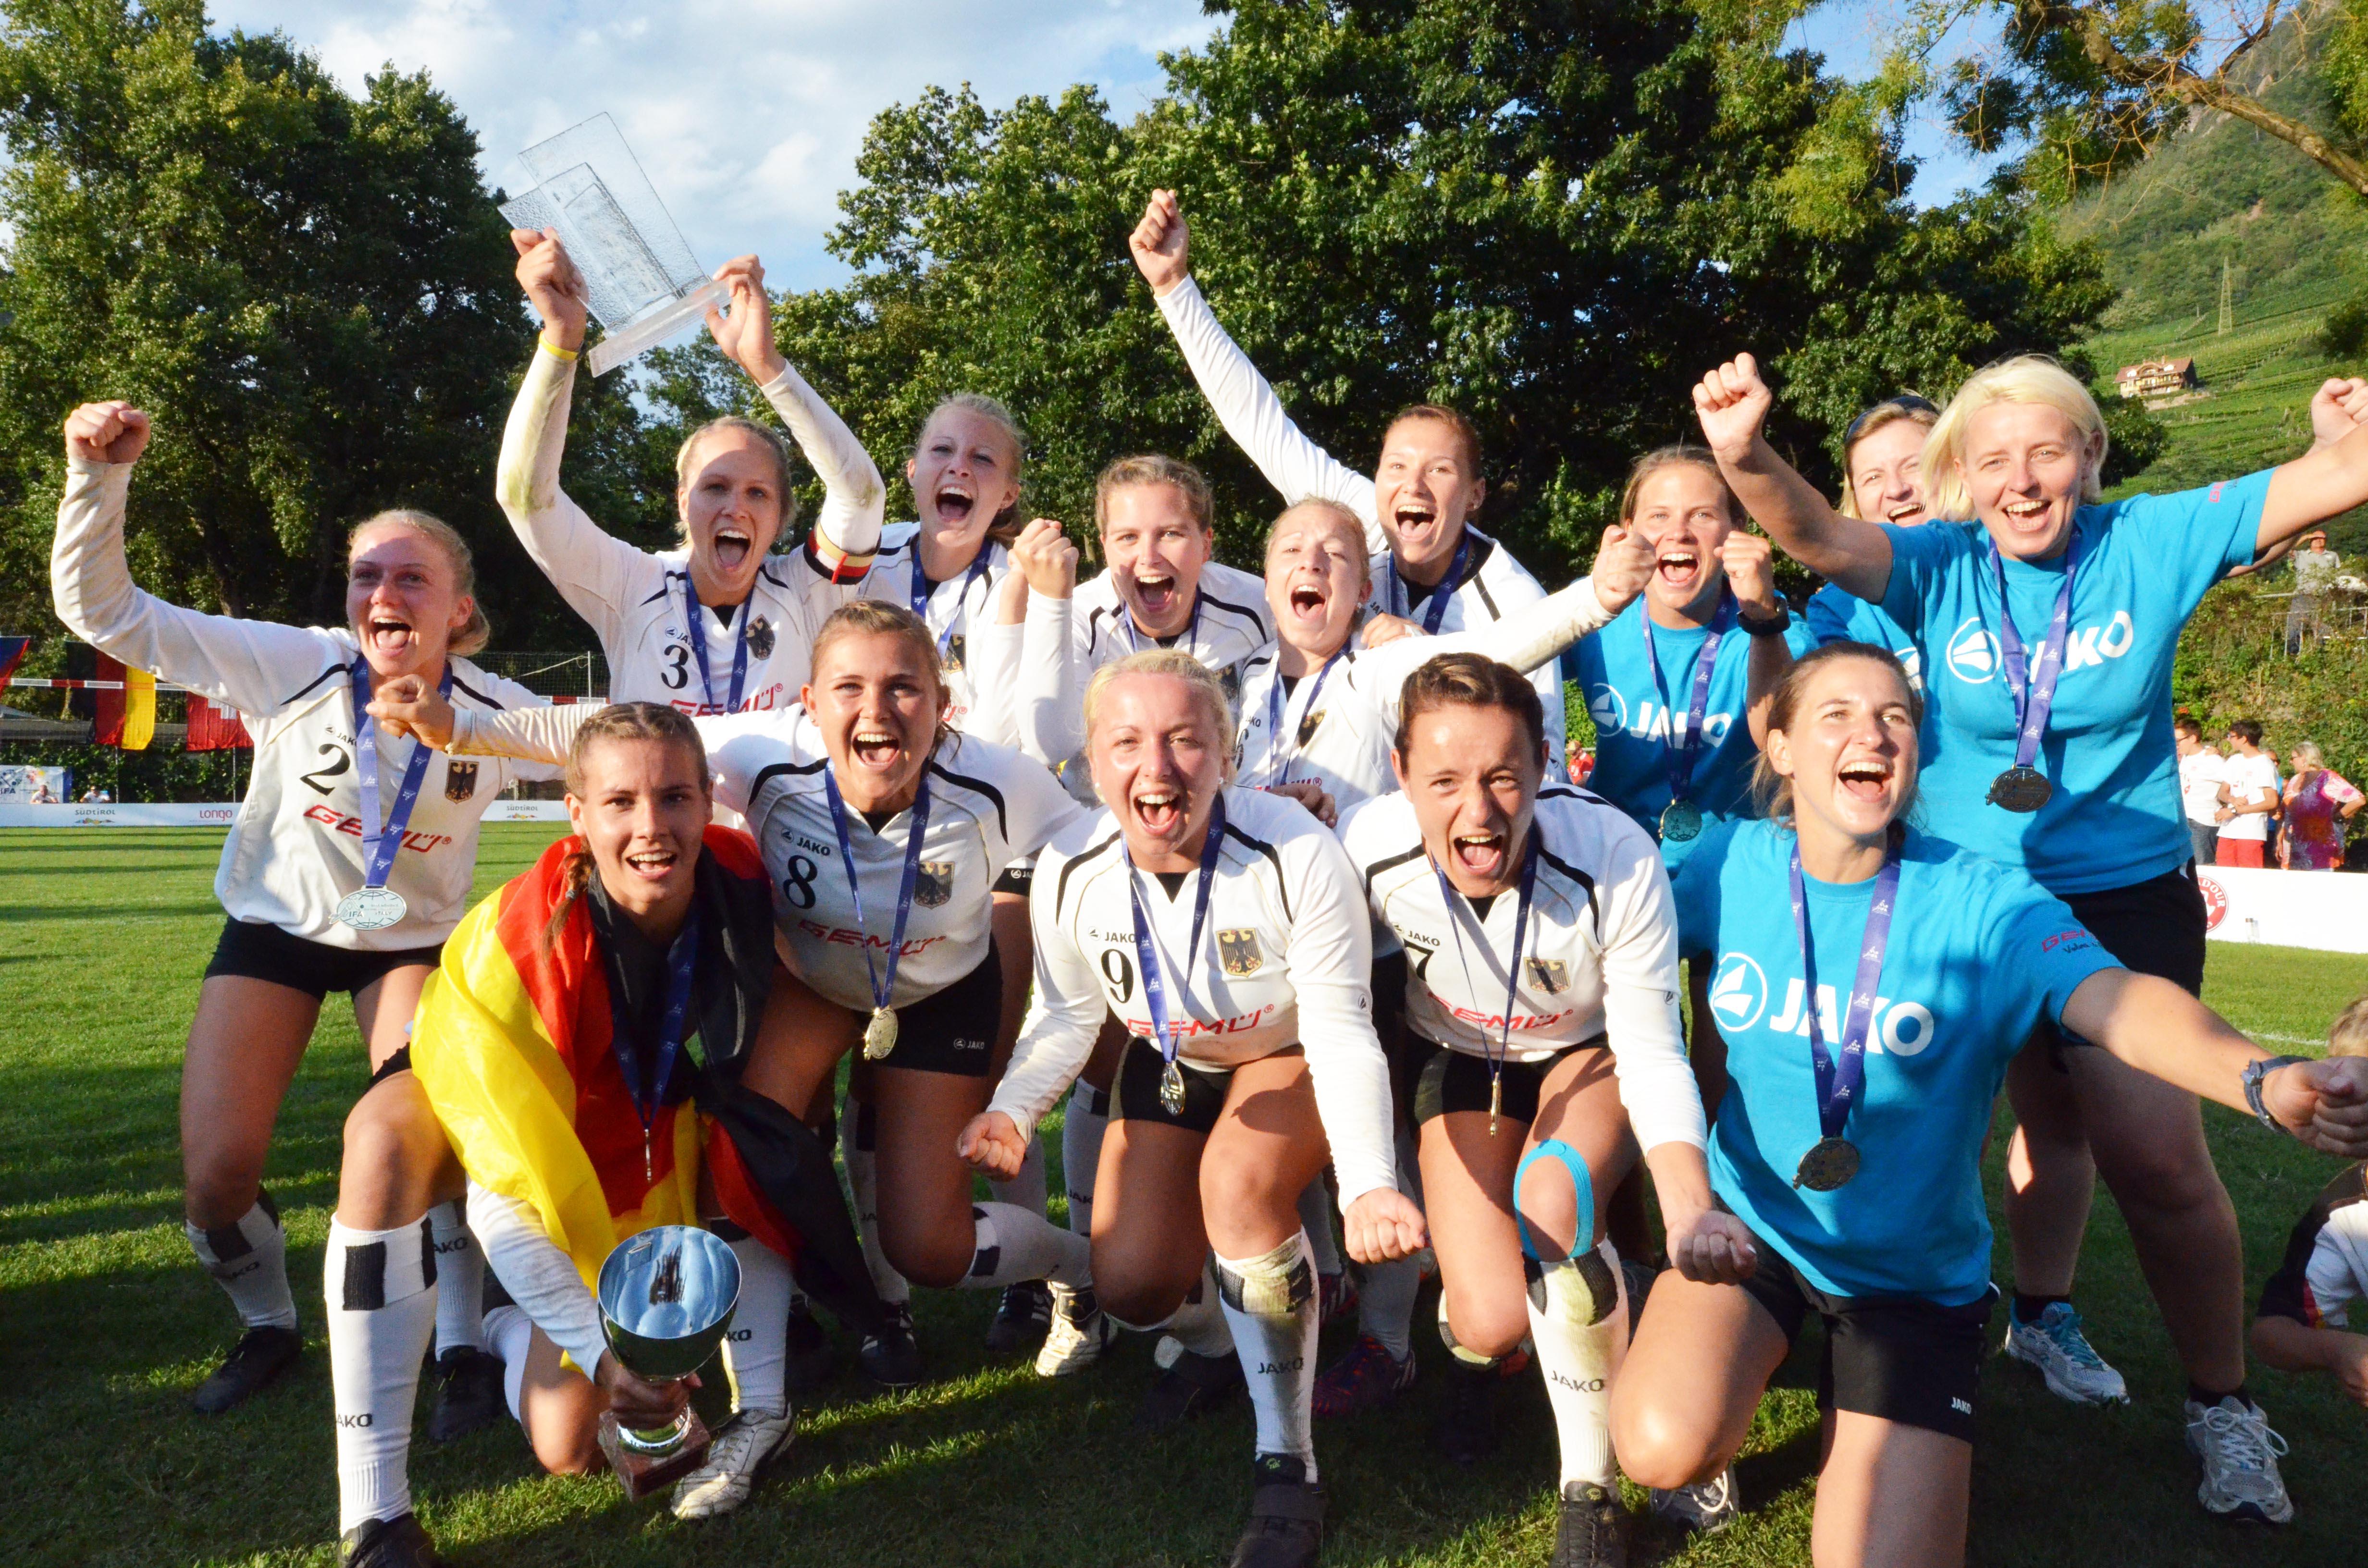 Auch 2016 möchten Deutschlands Faustball-Frauen wieder so schön jubeln. (Foto: Mats Hermanns)